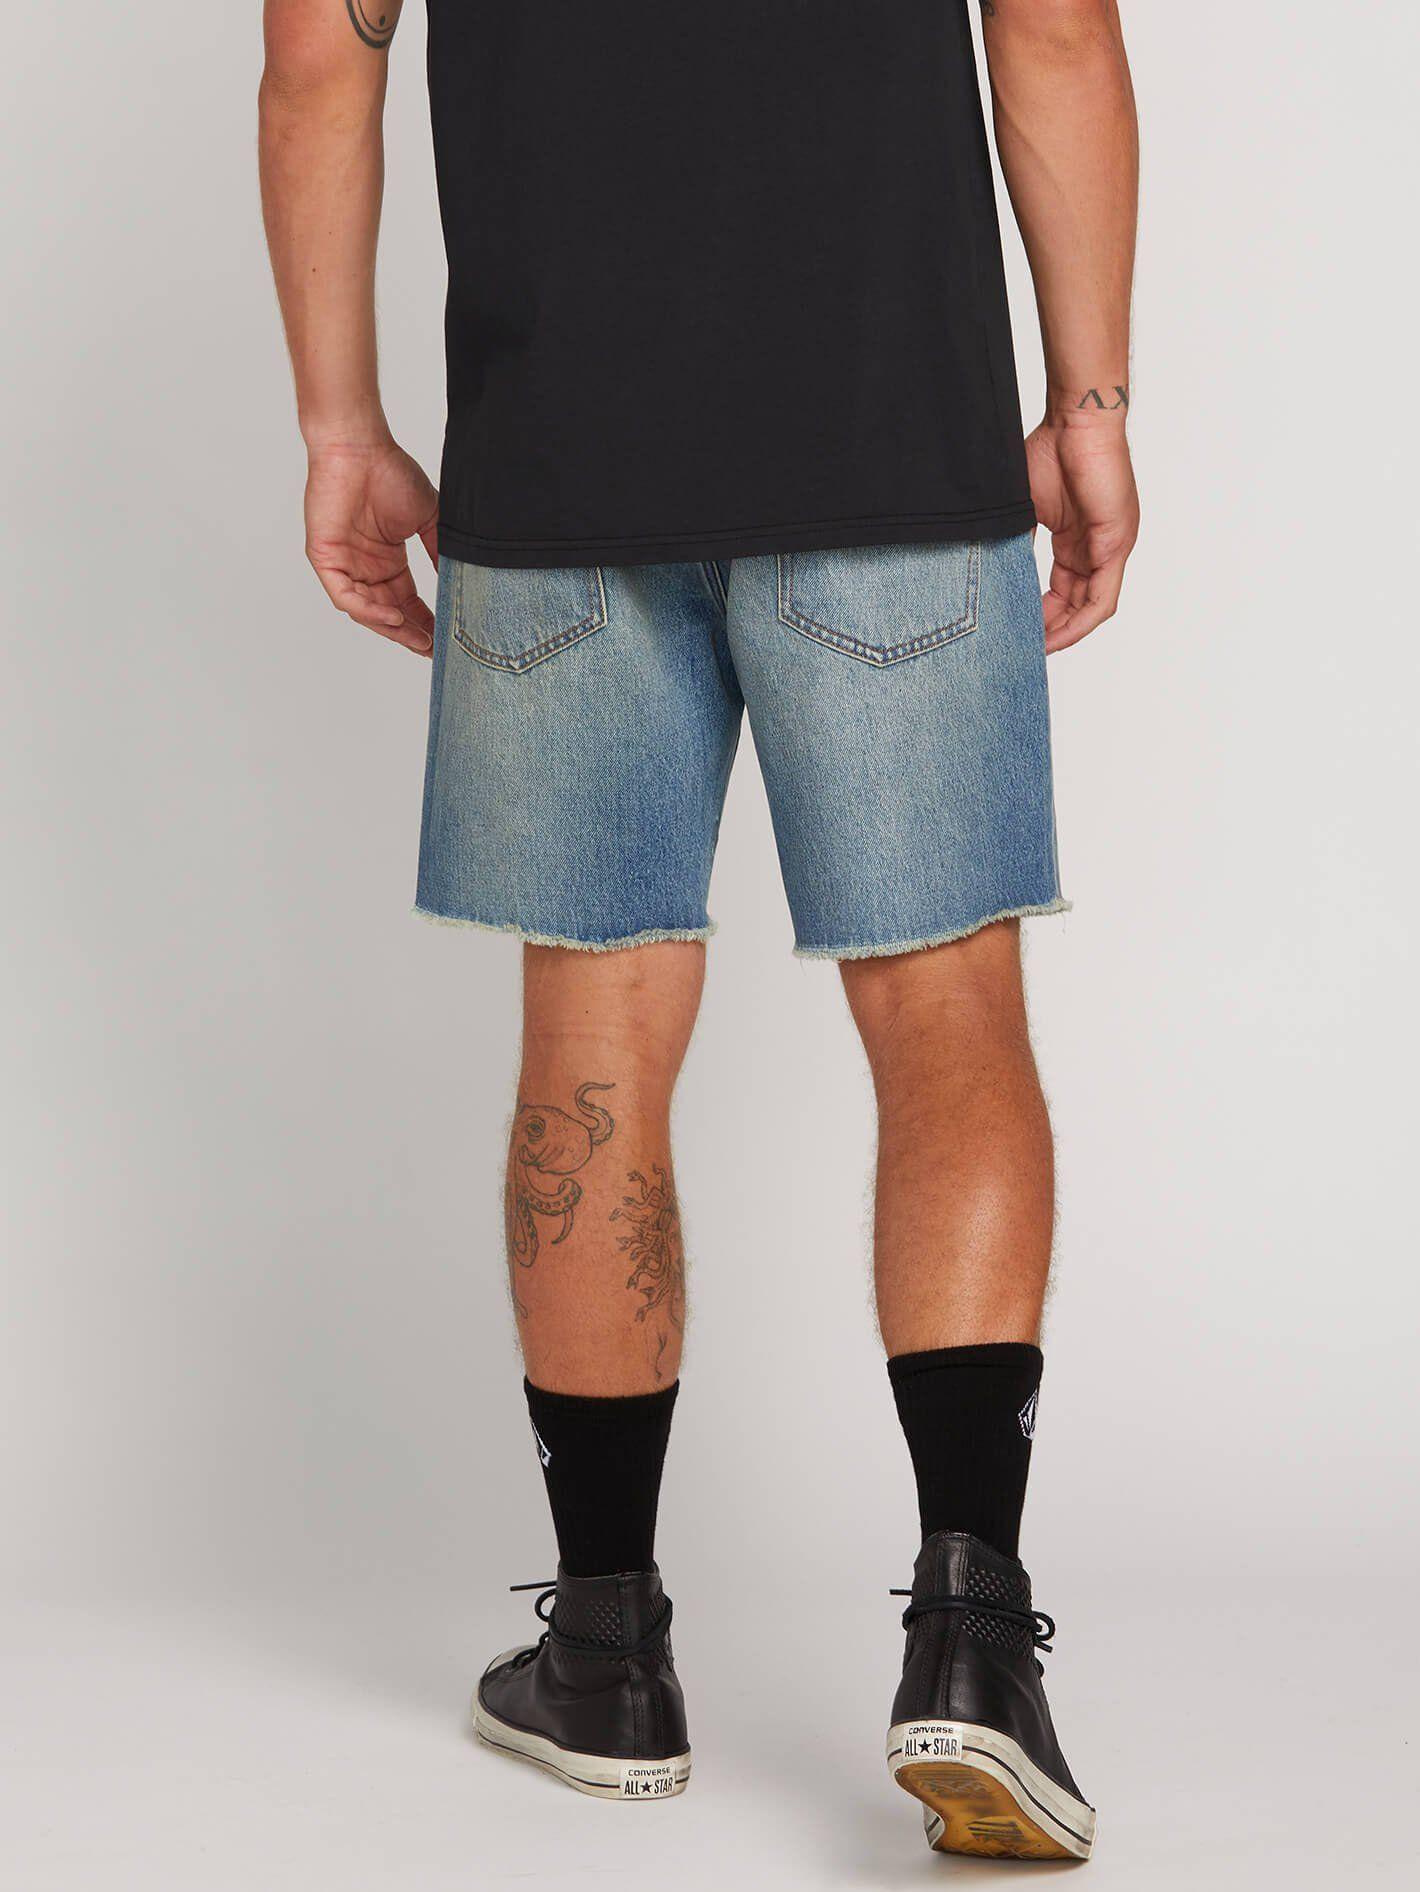 Kinkade Denim Cutoff Shorts - Faded Vin #denimcutoffshorts